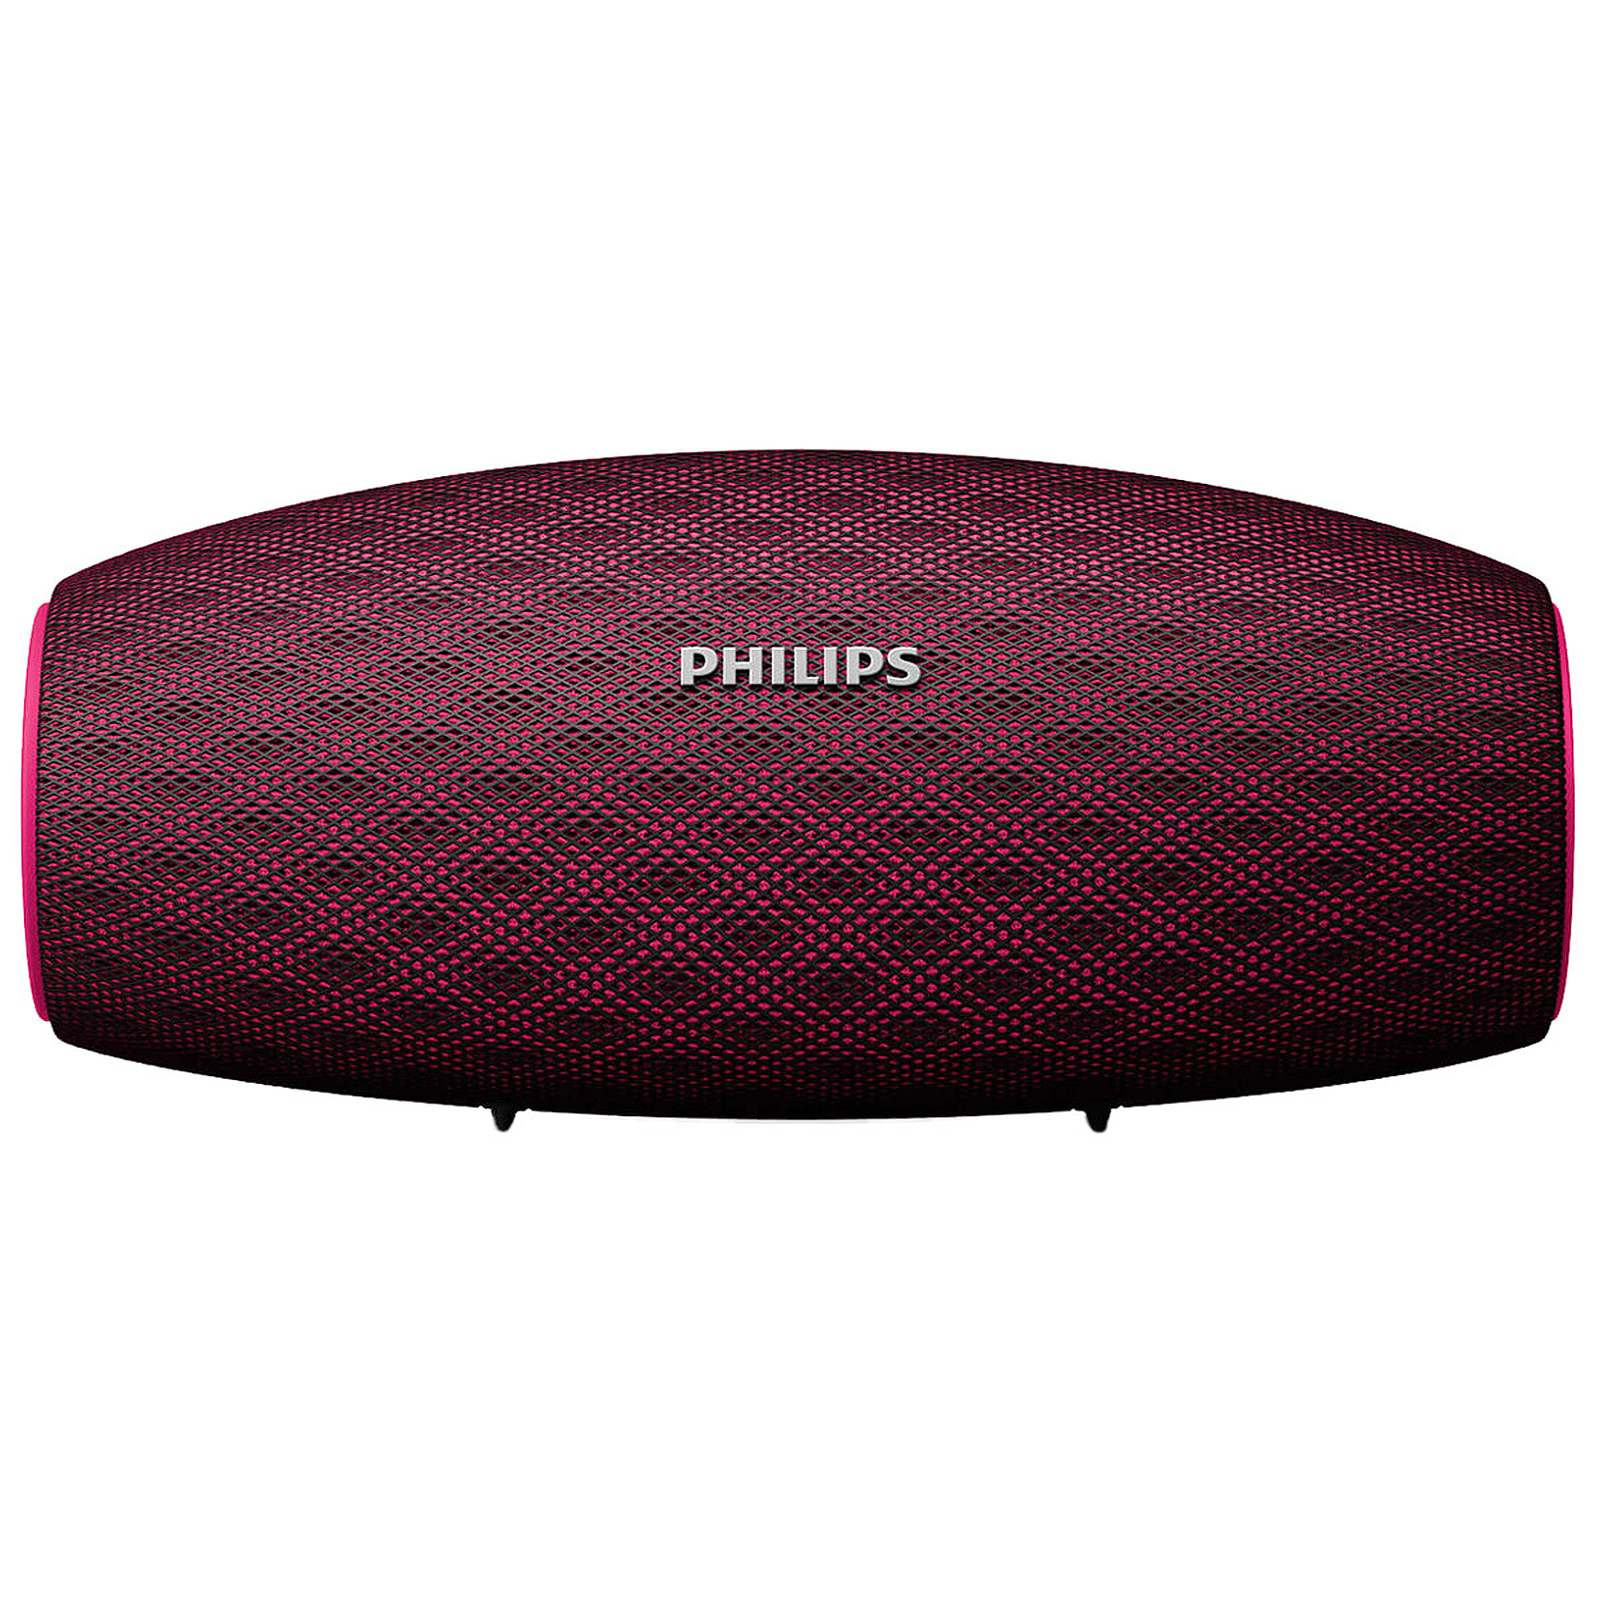 Philips BT6900 Rose